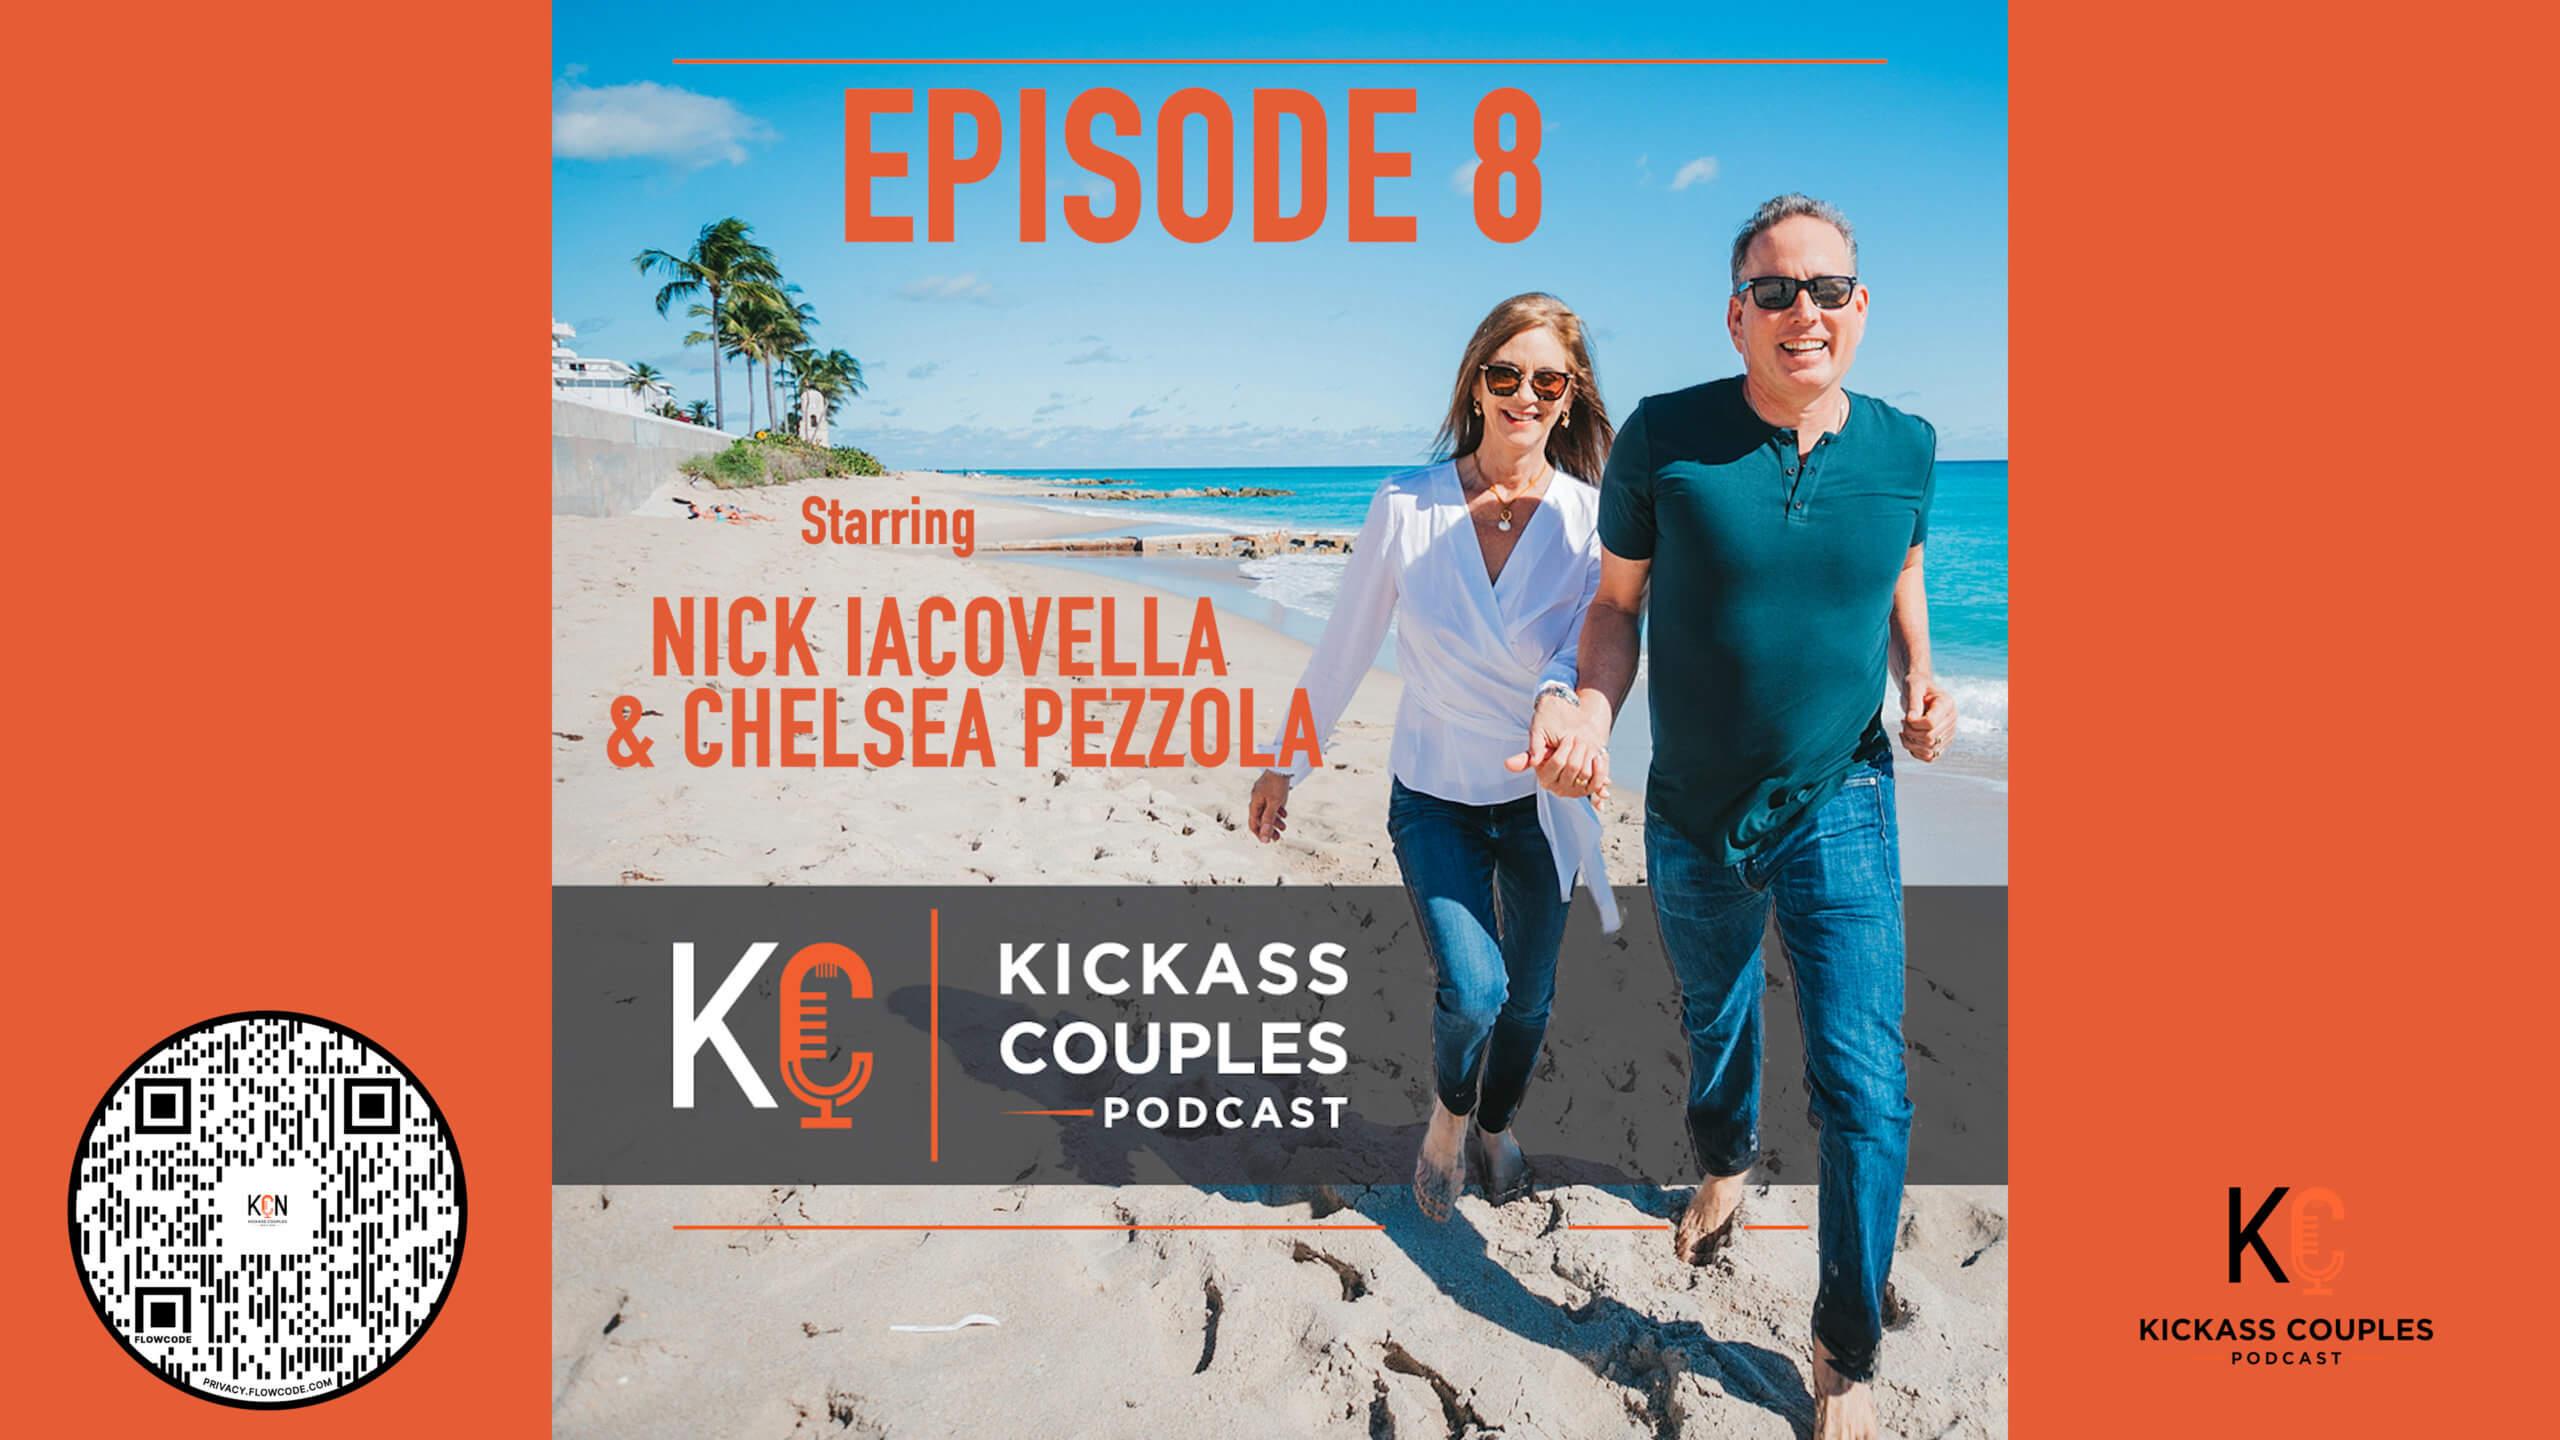 Episode 8: Pezzola